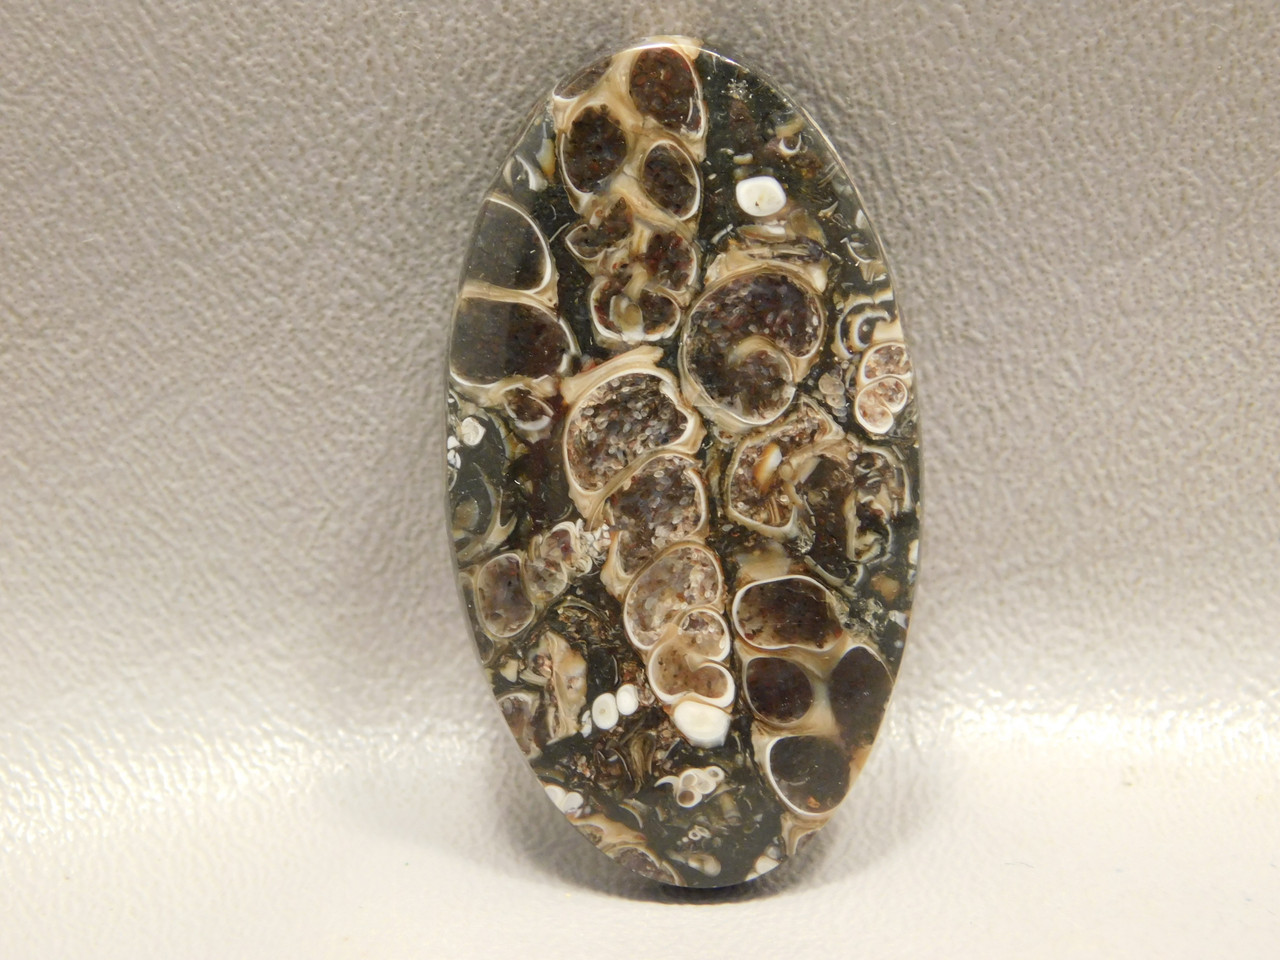 Turritella Agate Stone Natural Fossil Cabochon Wyoming #10